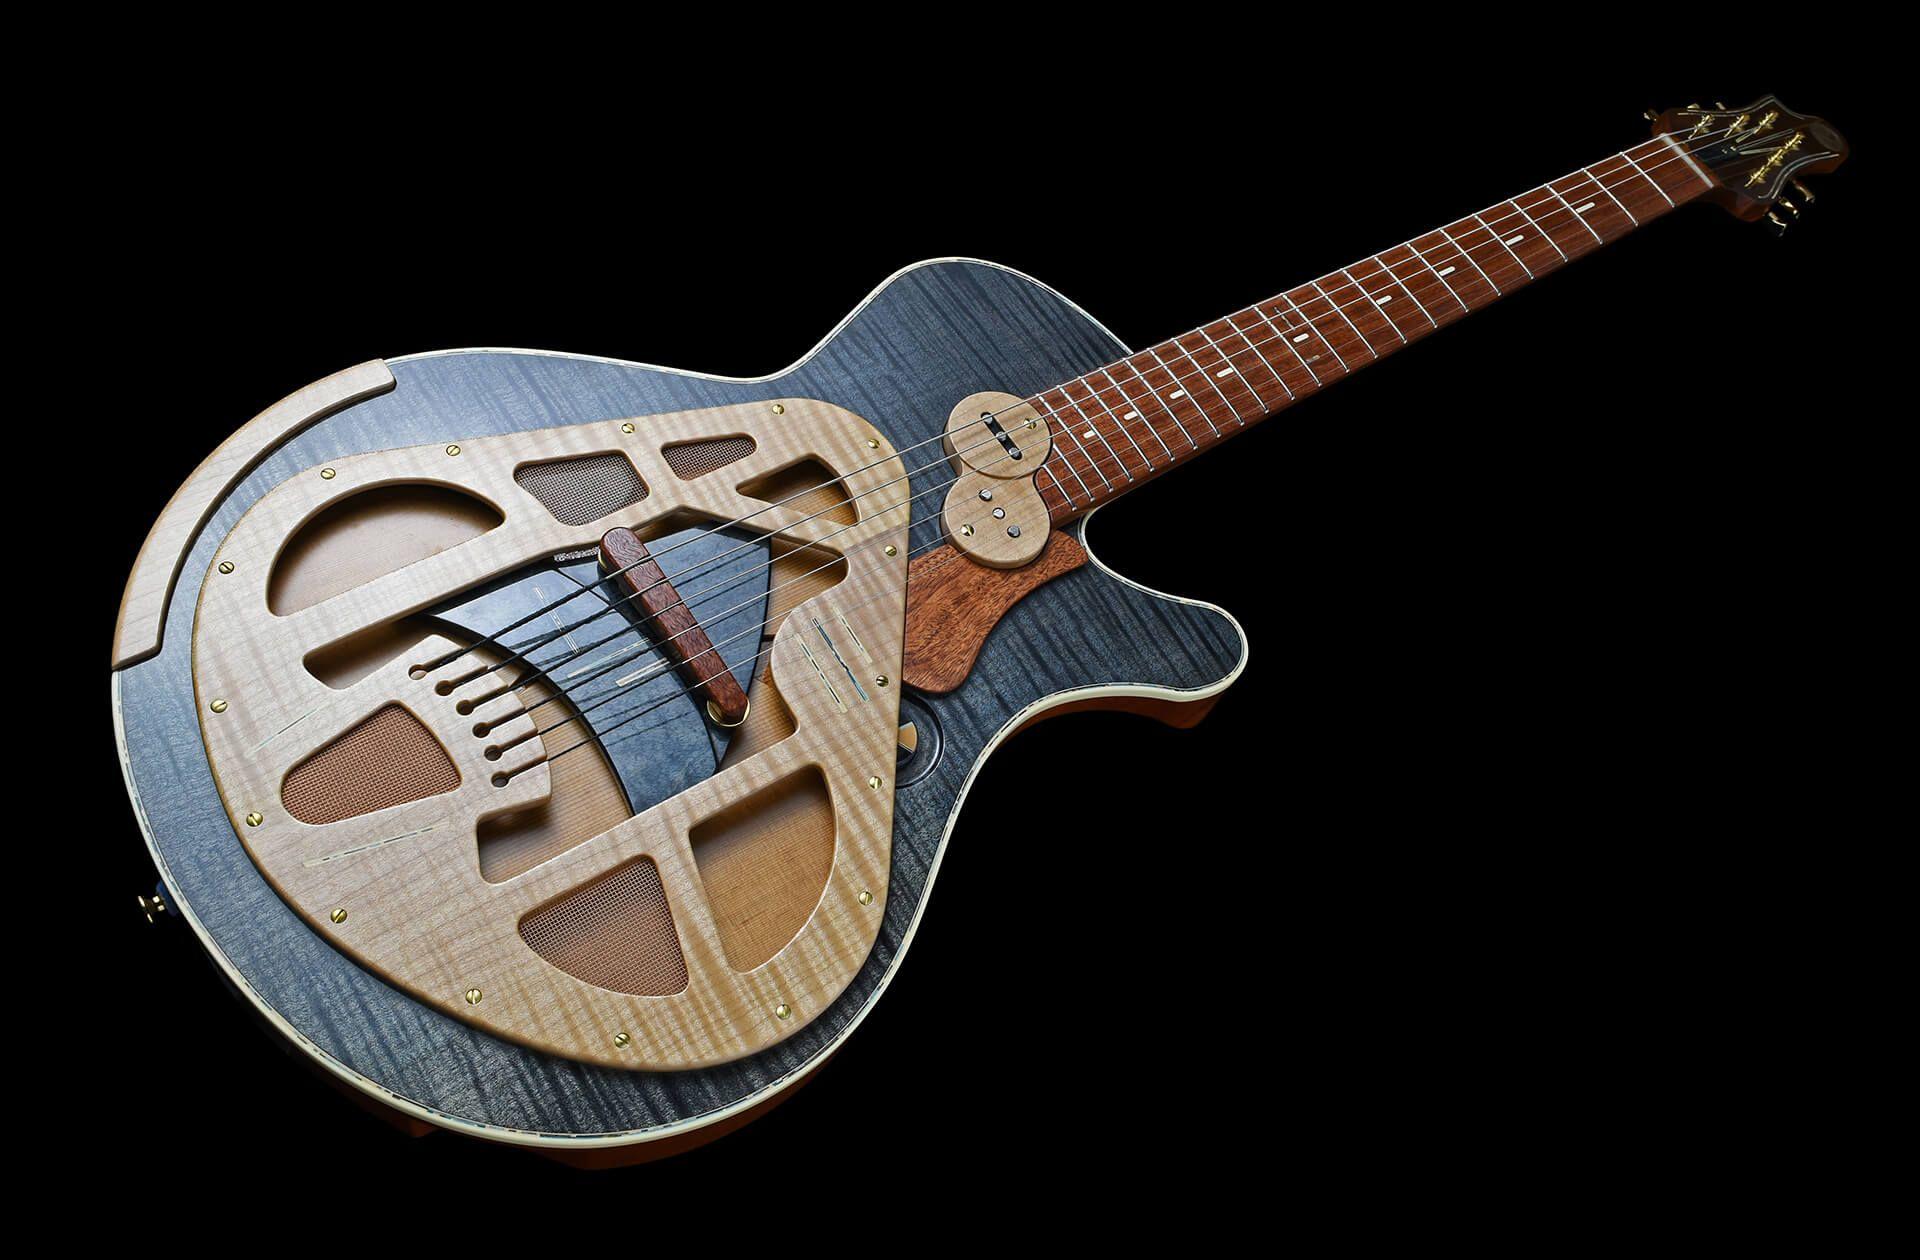 Jghg Teko Bass Guitar Guitar Electric Guitar Design